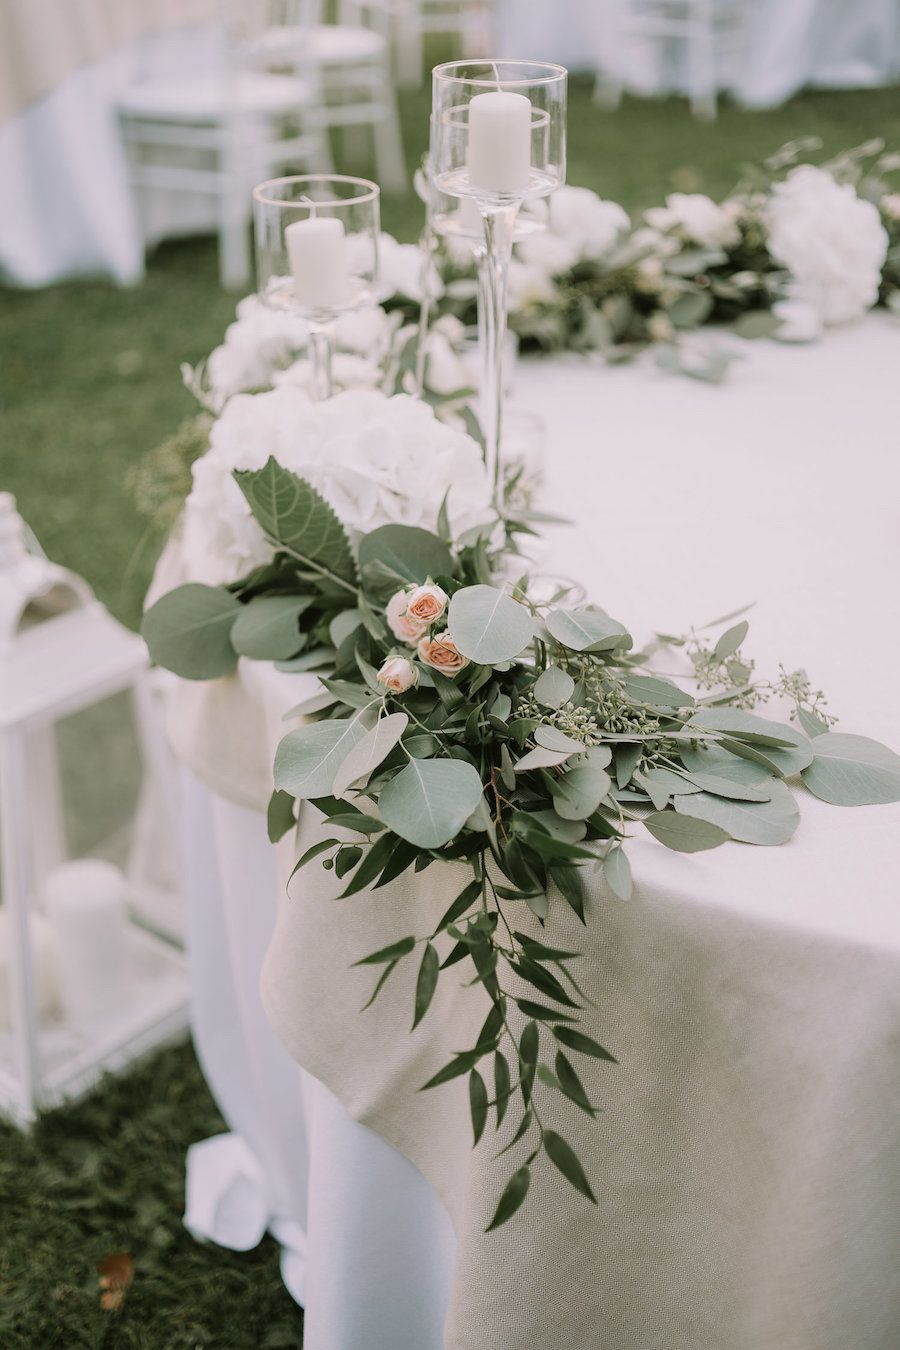 Foglie D Ulivo Per Un Matrimonio Organico Wedding Wonderland Centrotavola Matrimoniali Centrotavola Matrimonio Matrimonio